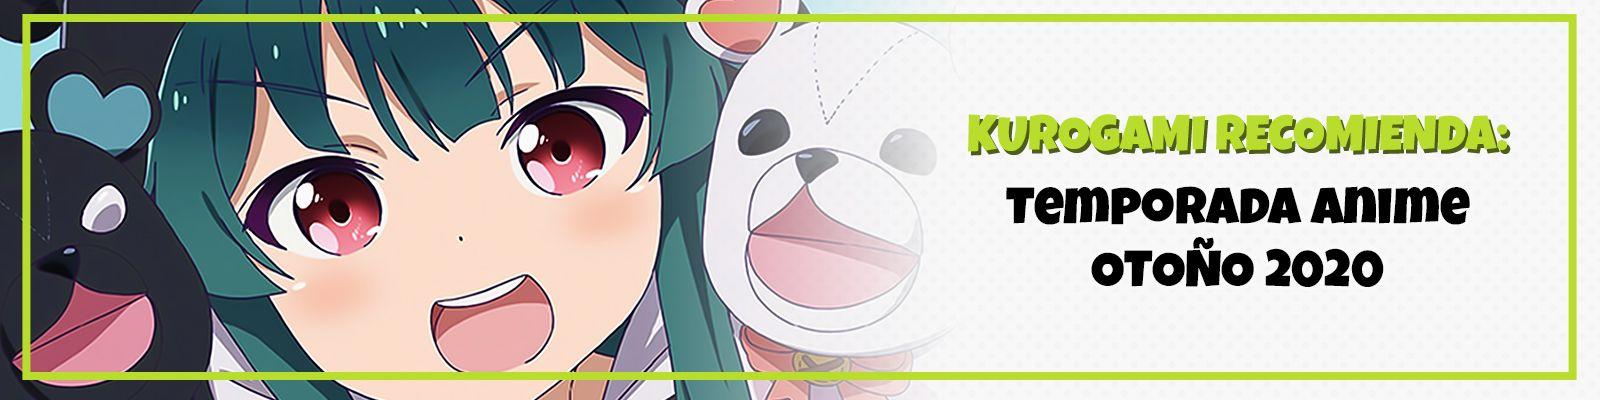 Kurogami Recomienda: Temporada Anime Otoño 2020